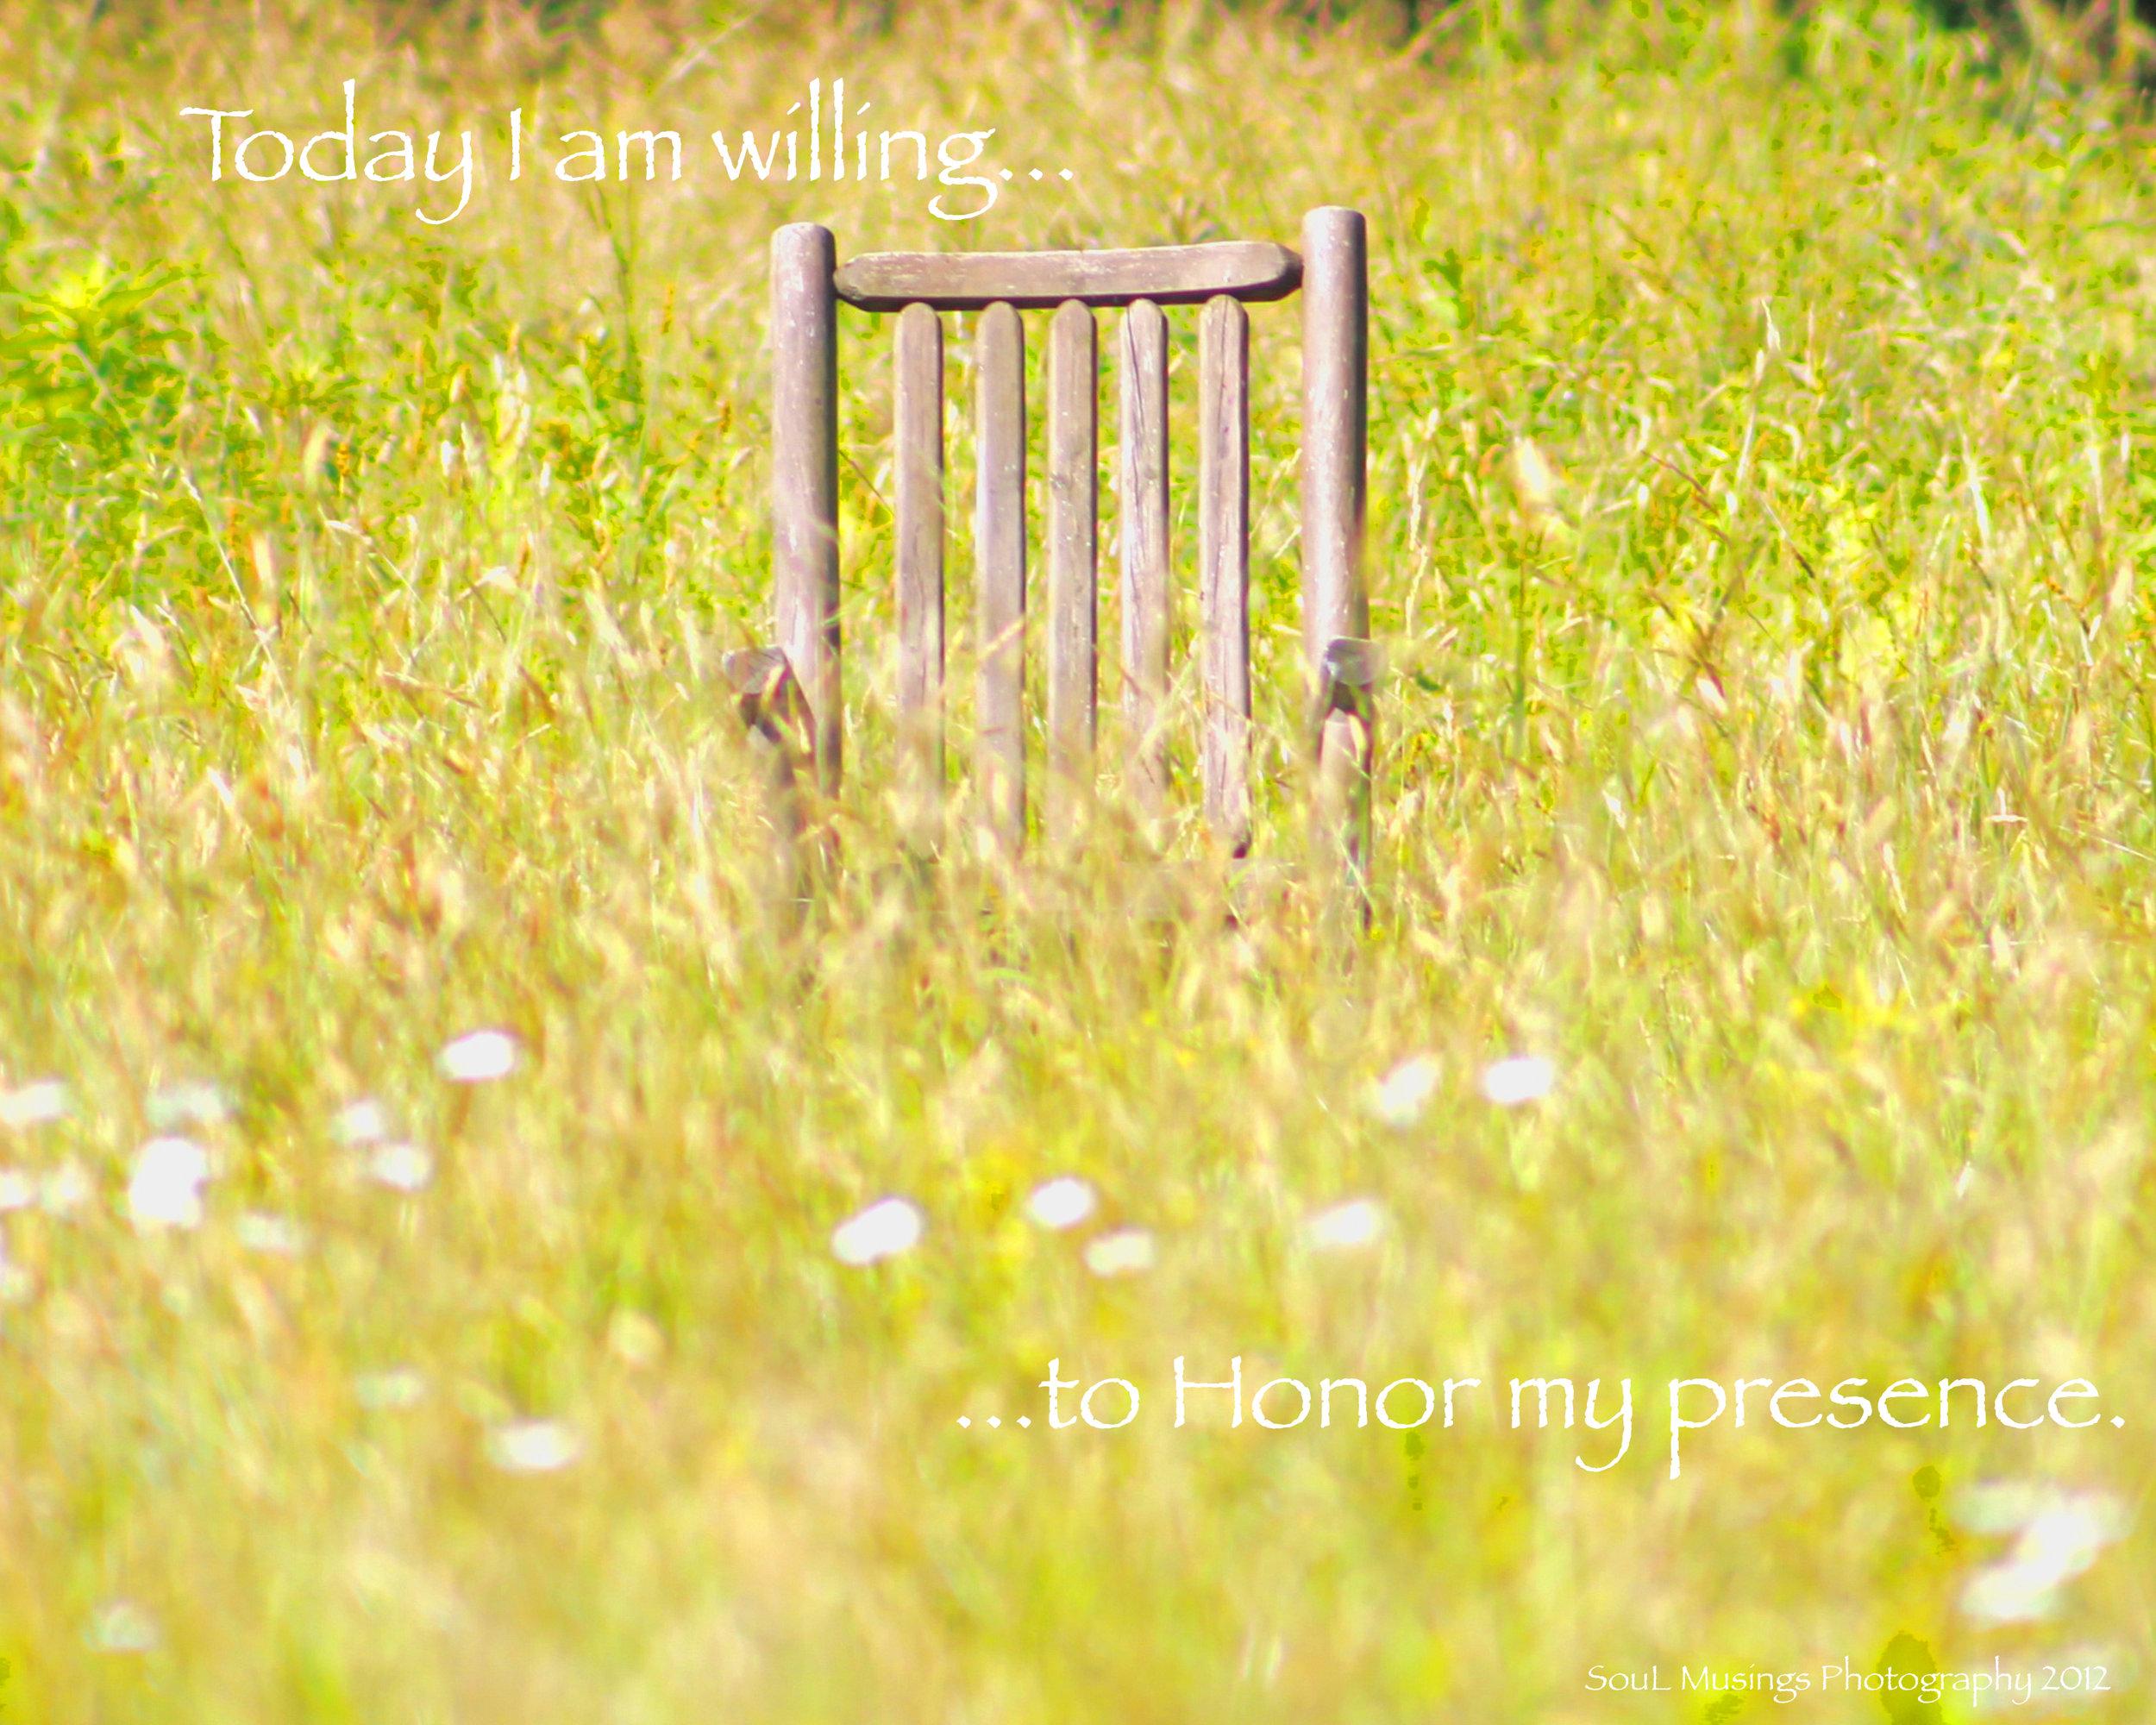 Chair in the field_Presence.jpg